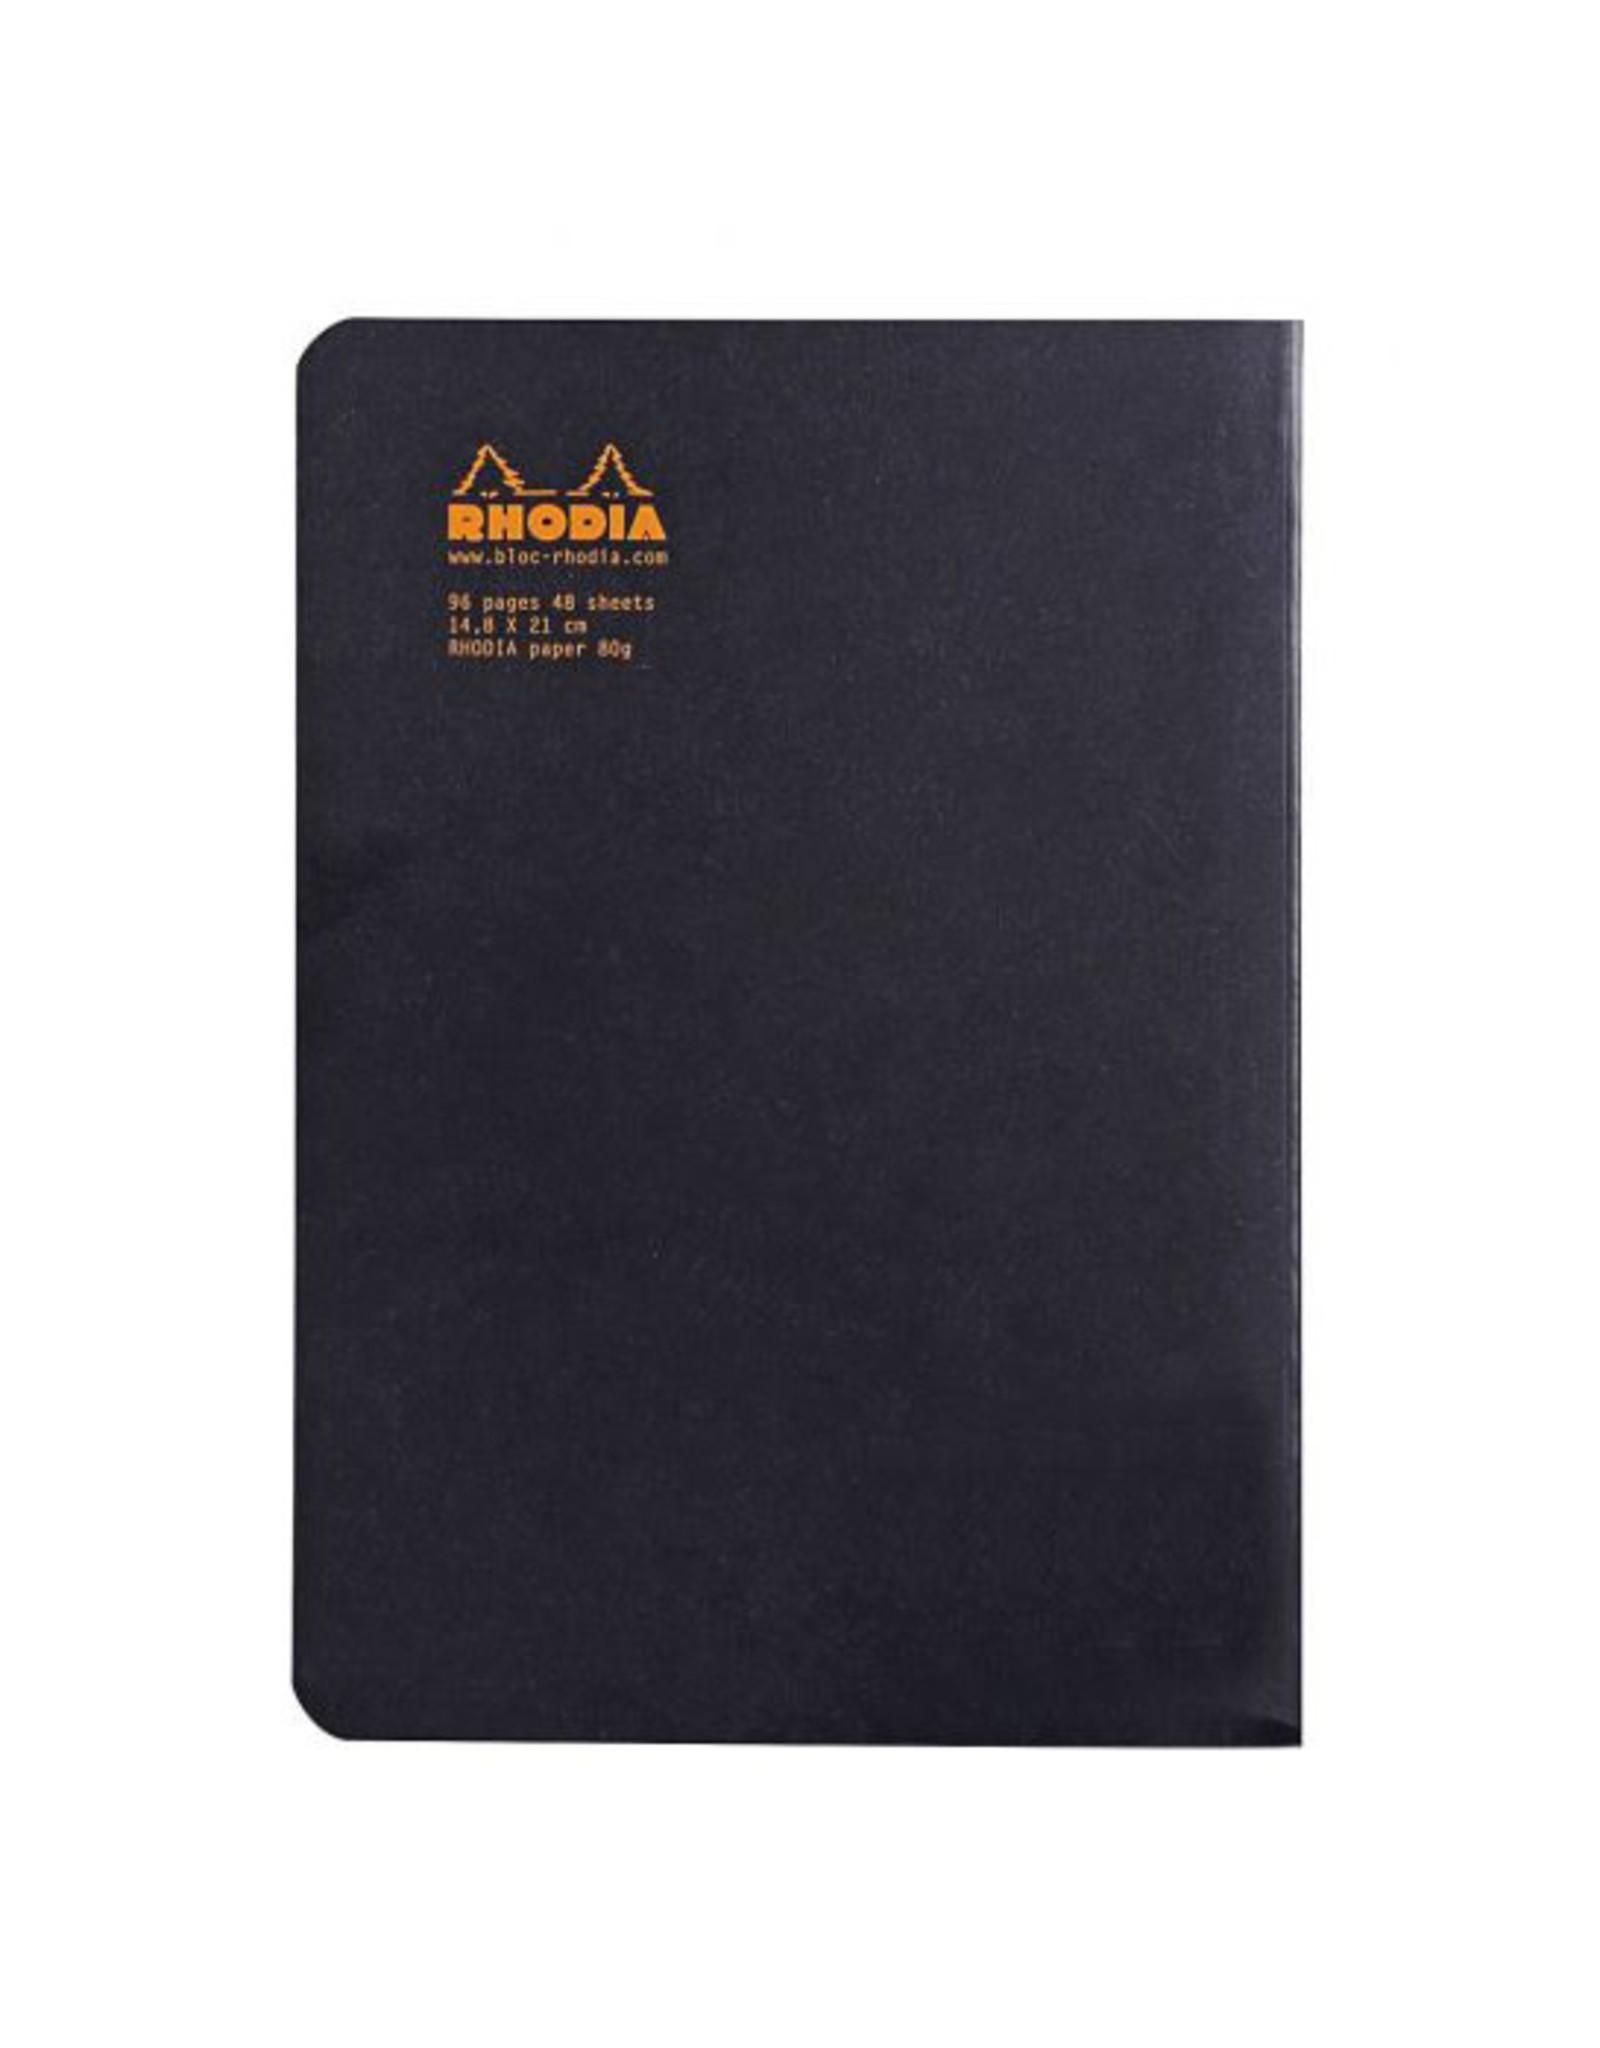 Rhodia Rhodia Black Lined Classic Notebook 6 x 8.25